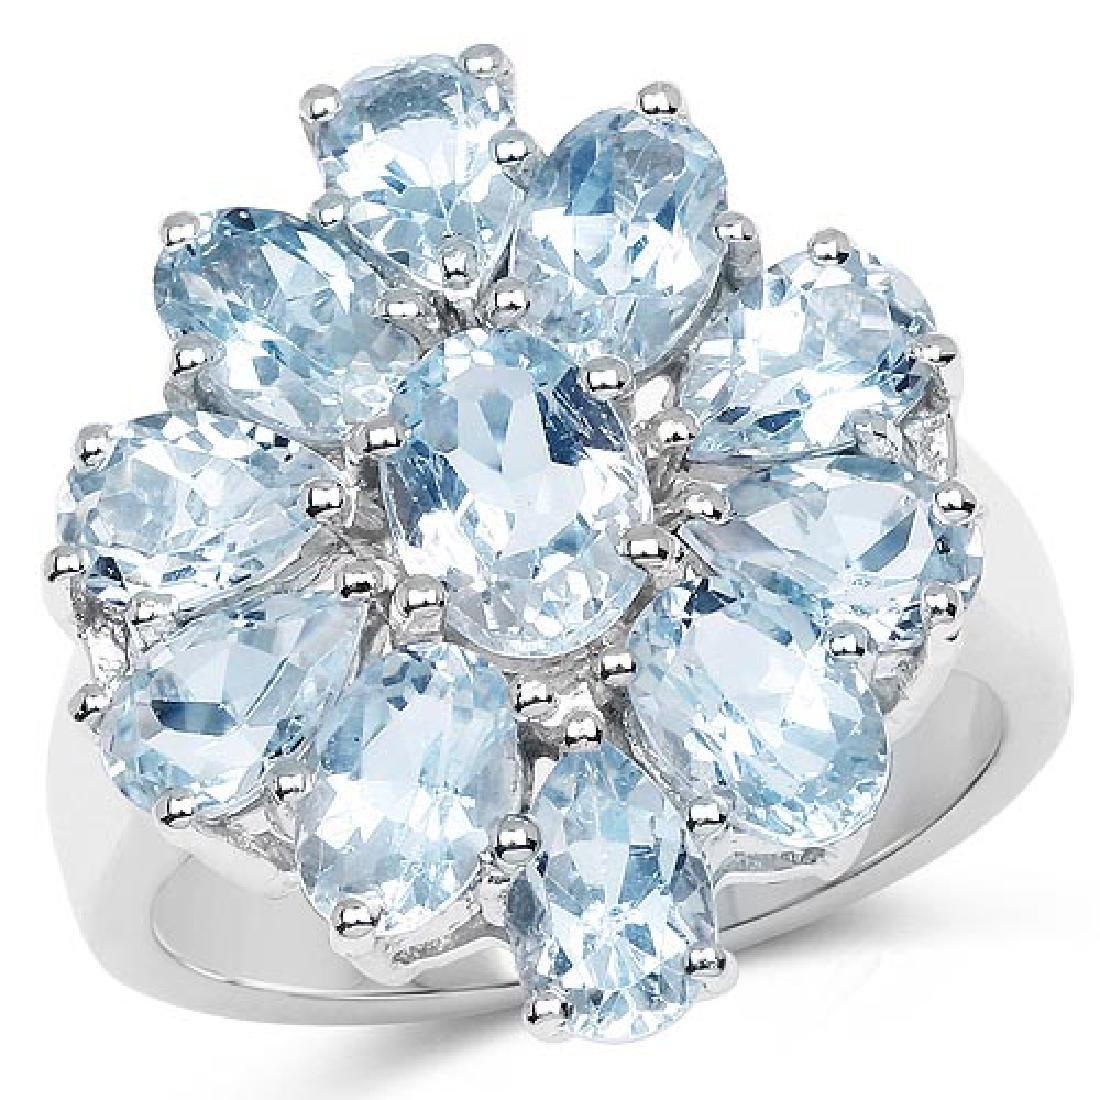 5.87 Carat Genuine Blue Topaz .925 Sterling Silver Ring